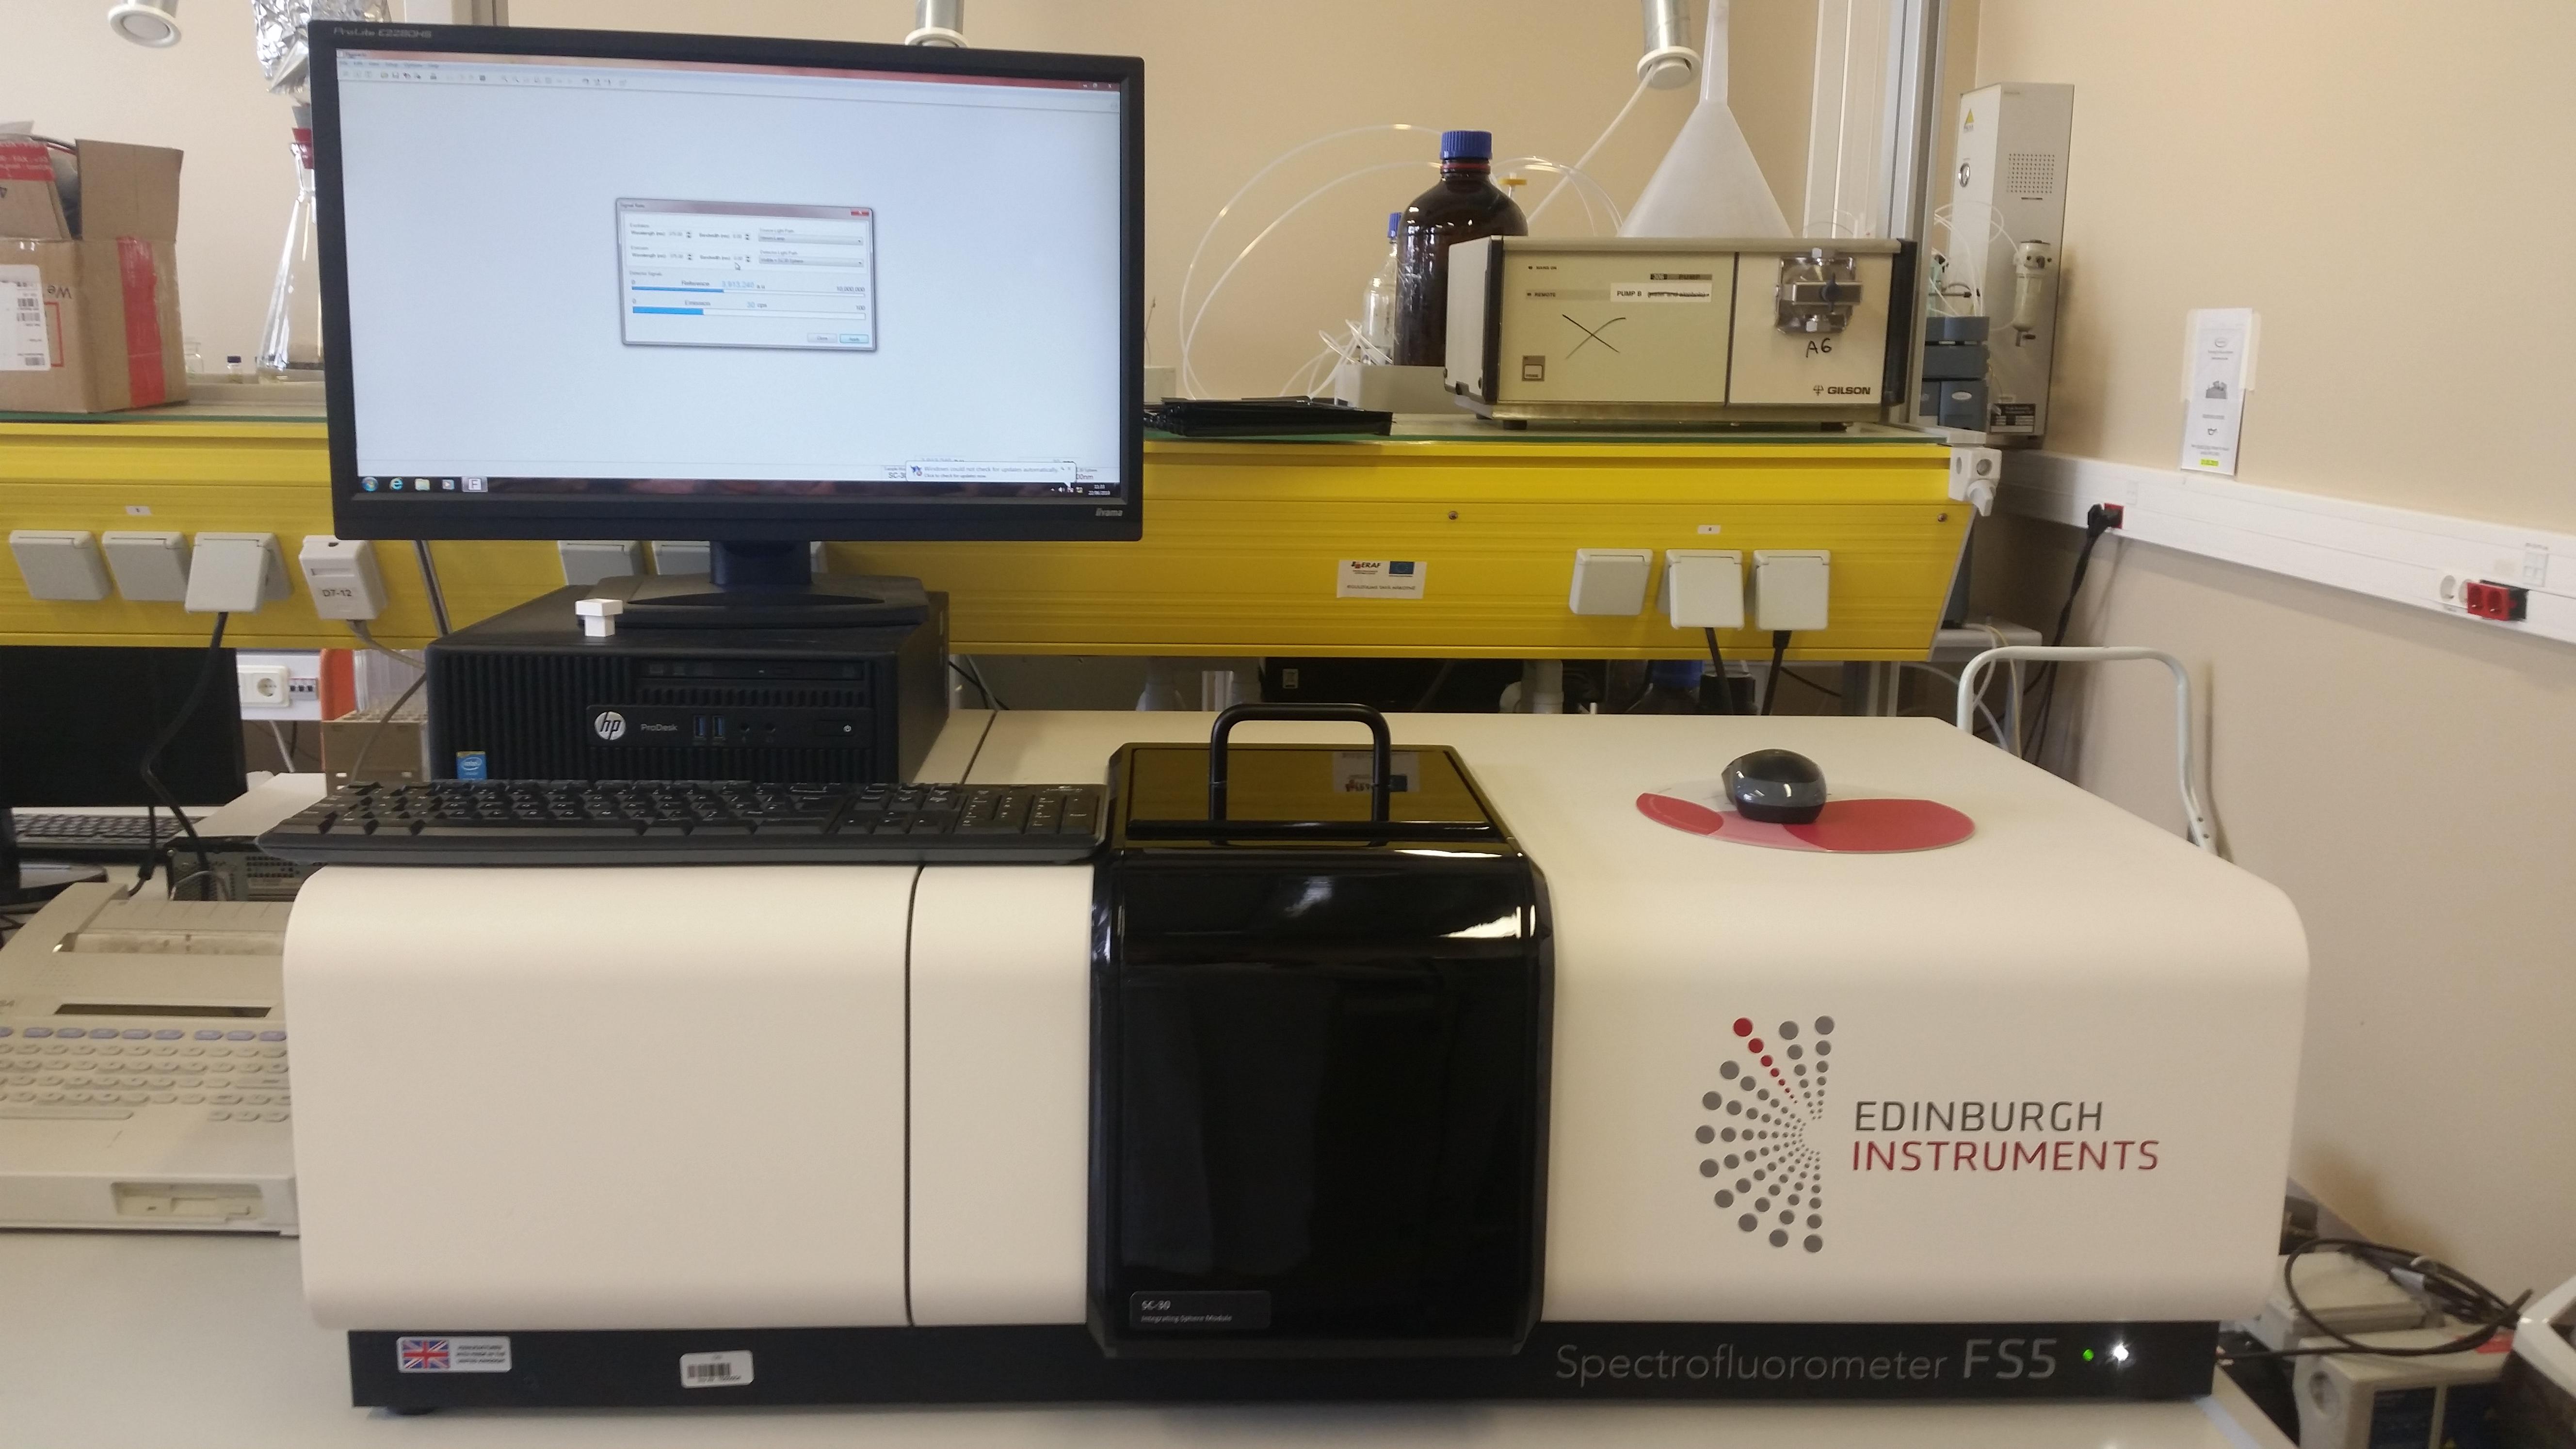 Spectrofluorometer FS5